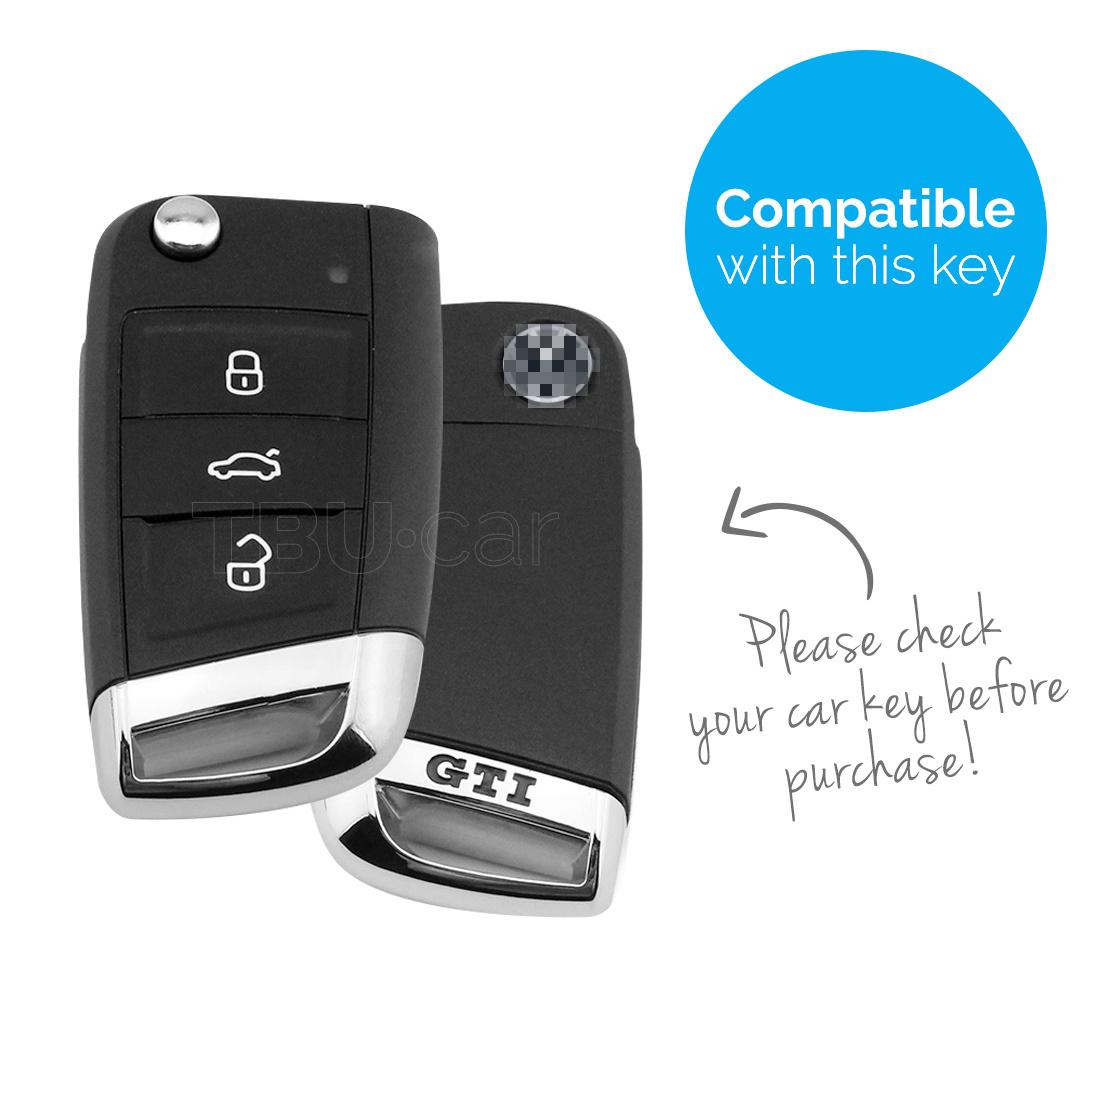 TBU car TBU car Autoschlüssel Hülle kompatibel mit VW GTI / R-Line 3 Tasten - Schutzhülle aus Silikon - Auto Schlüsselhülle Cover in Orange